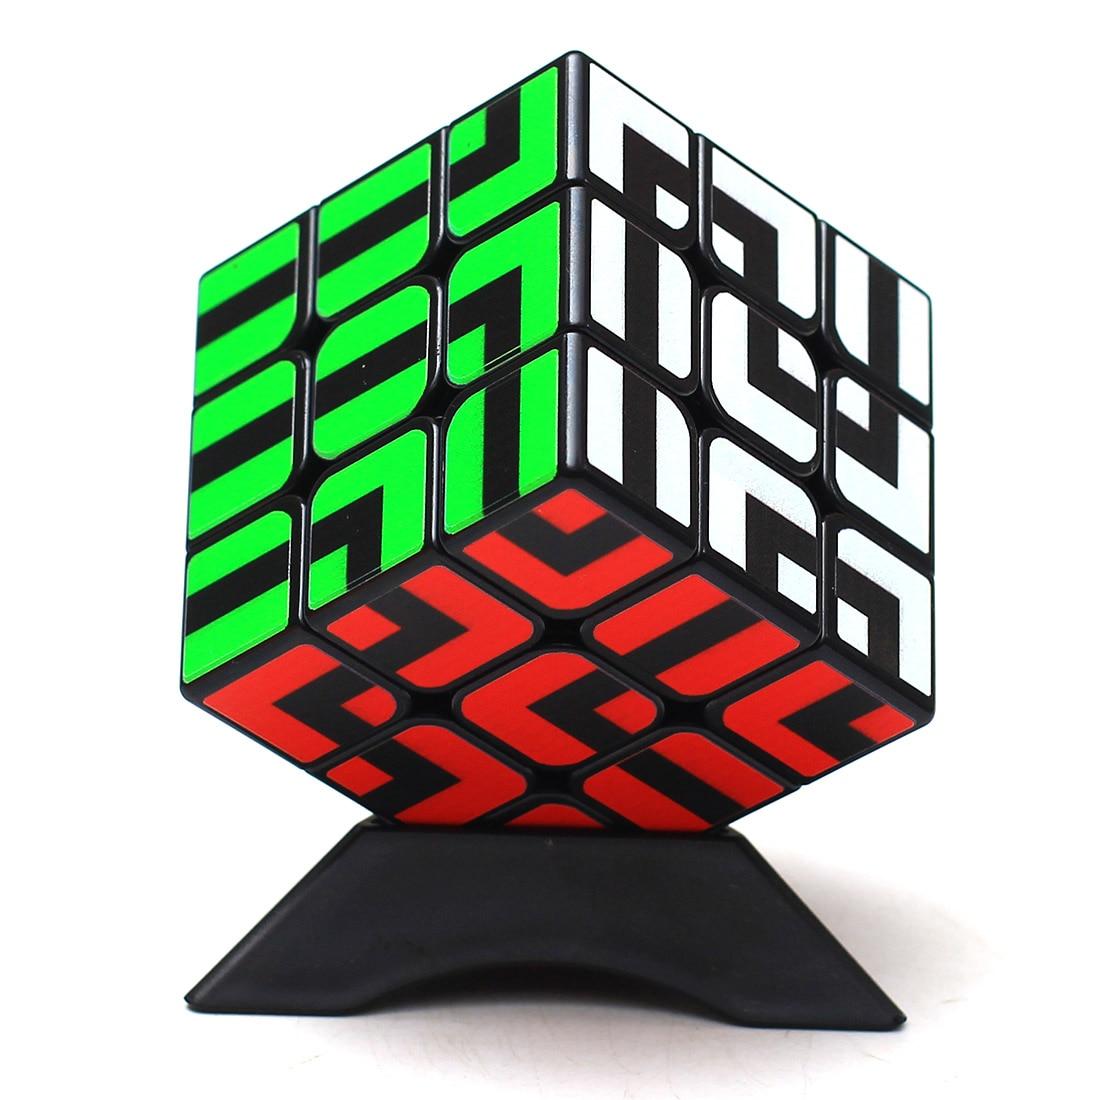 Z-cube Maze Type 3x3x3 Magic Cube Puzzle Cube Intelligent Gift Toys For Children Black Sticker Strange Shape Cube